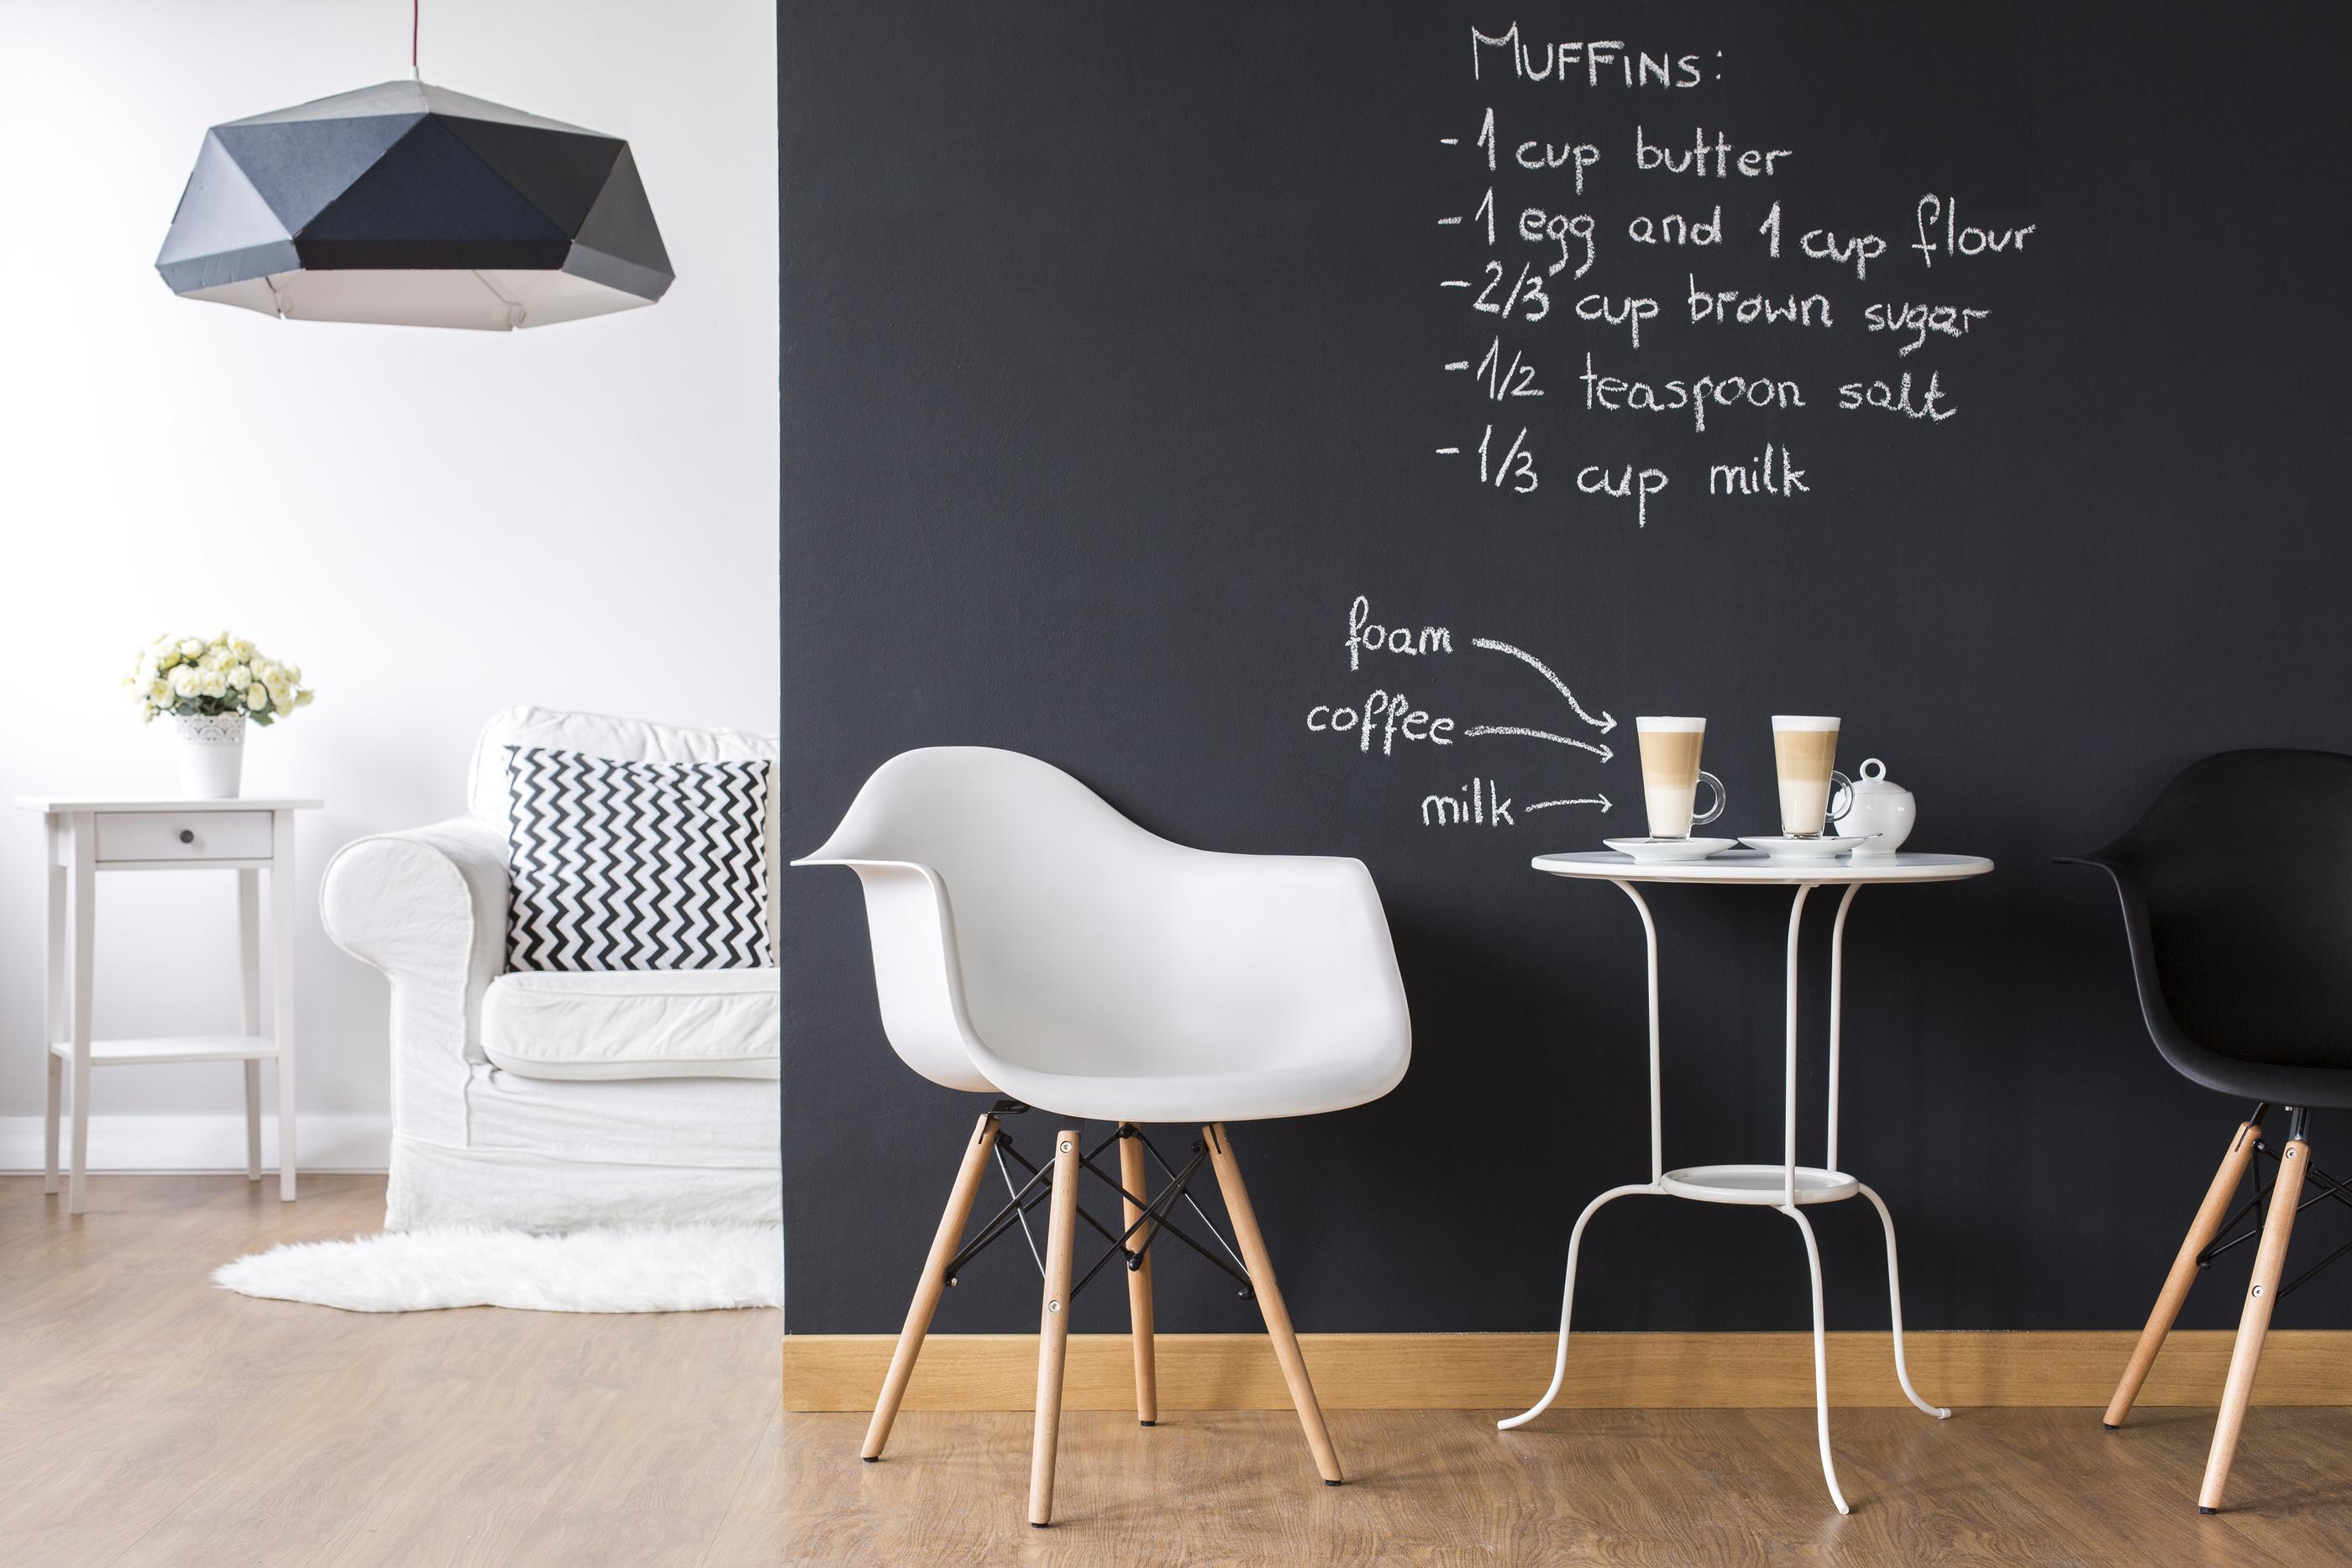 bigstock Studio Flat With Blackboard Wa 133703759 - Pared de pizarra, dónde aprovecharla al máximo